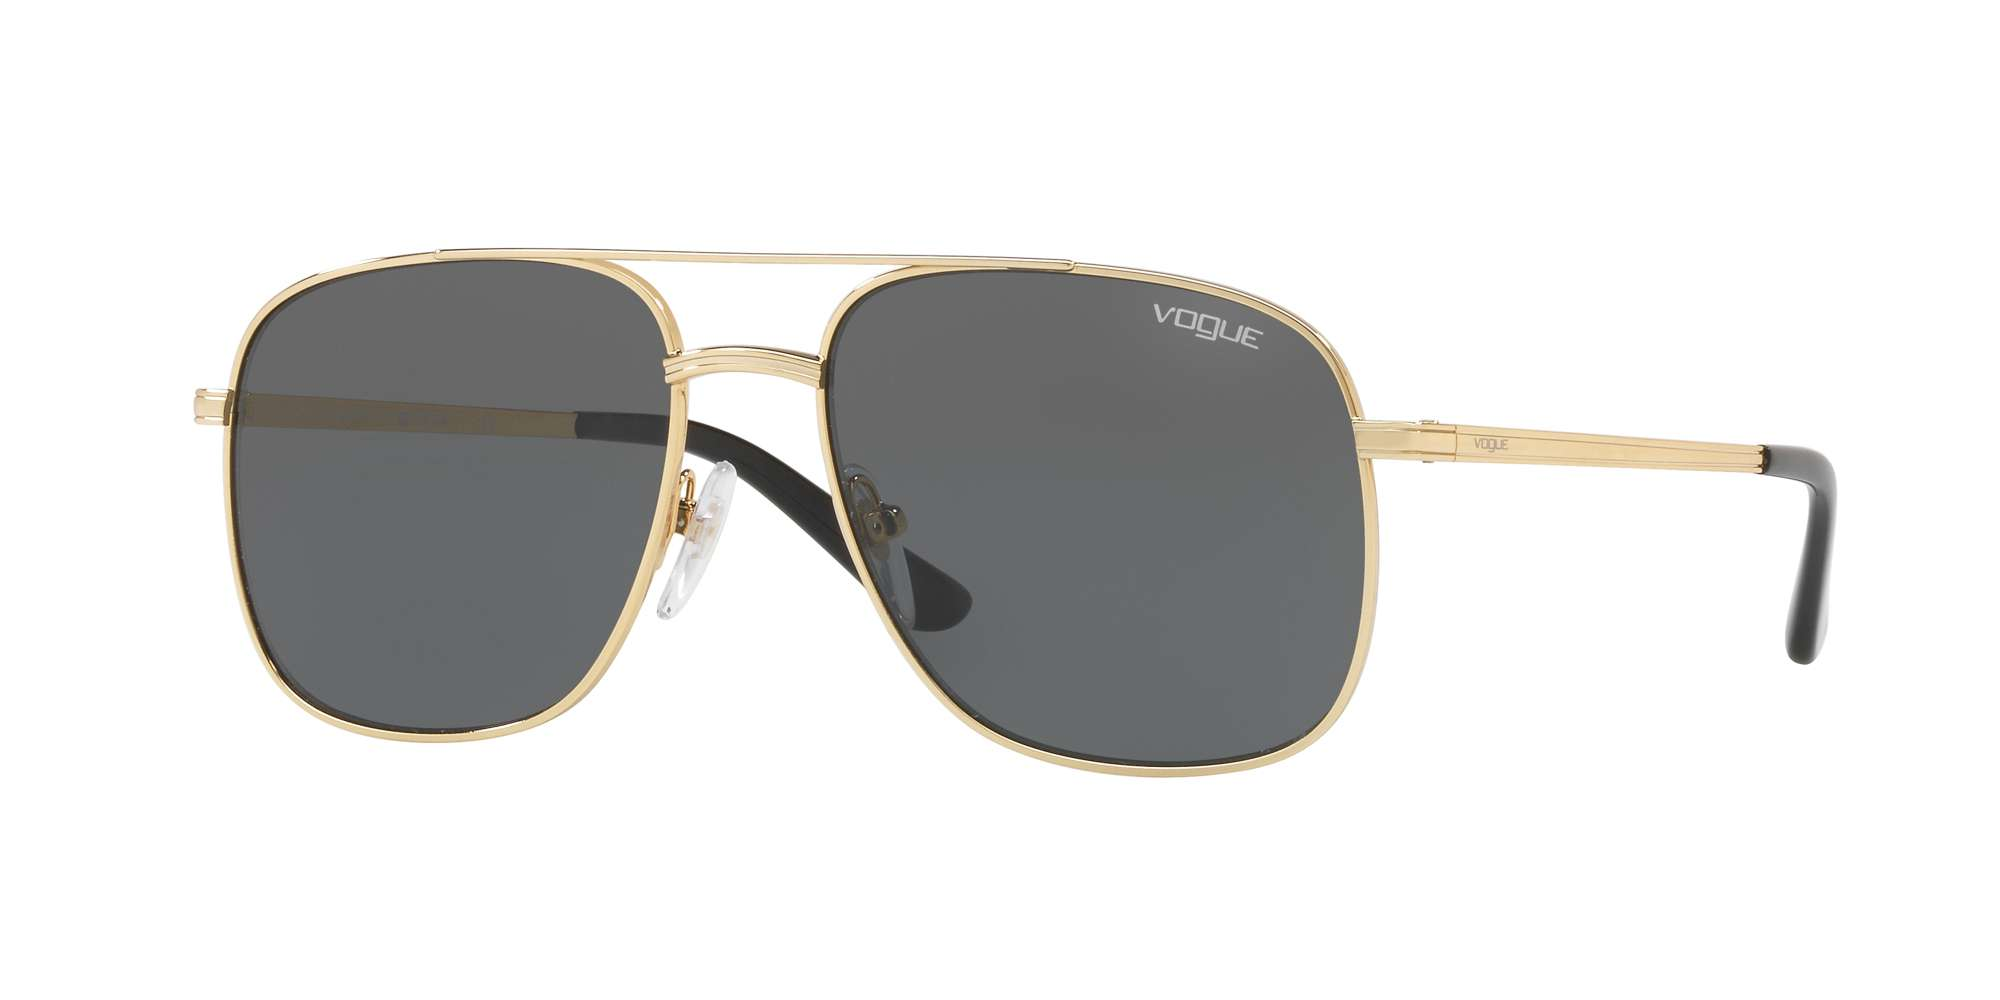 GOLD / GREY lenses